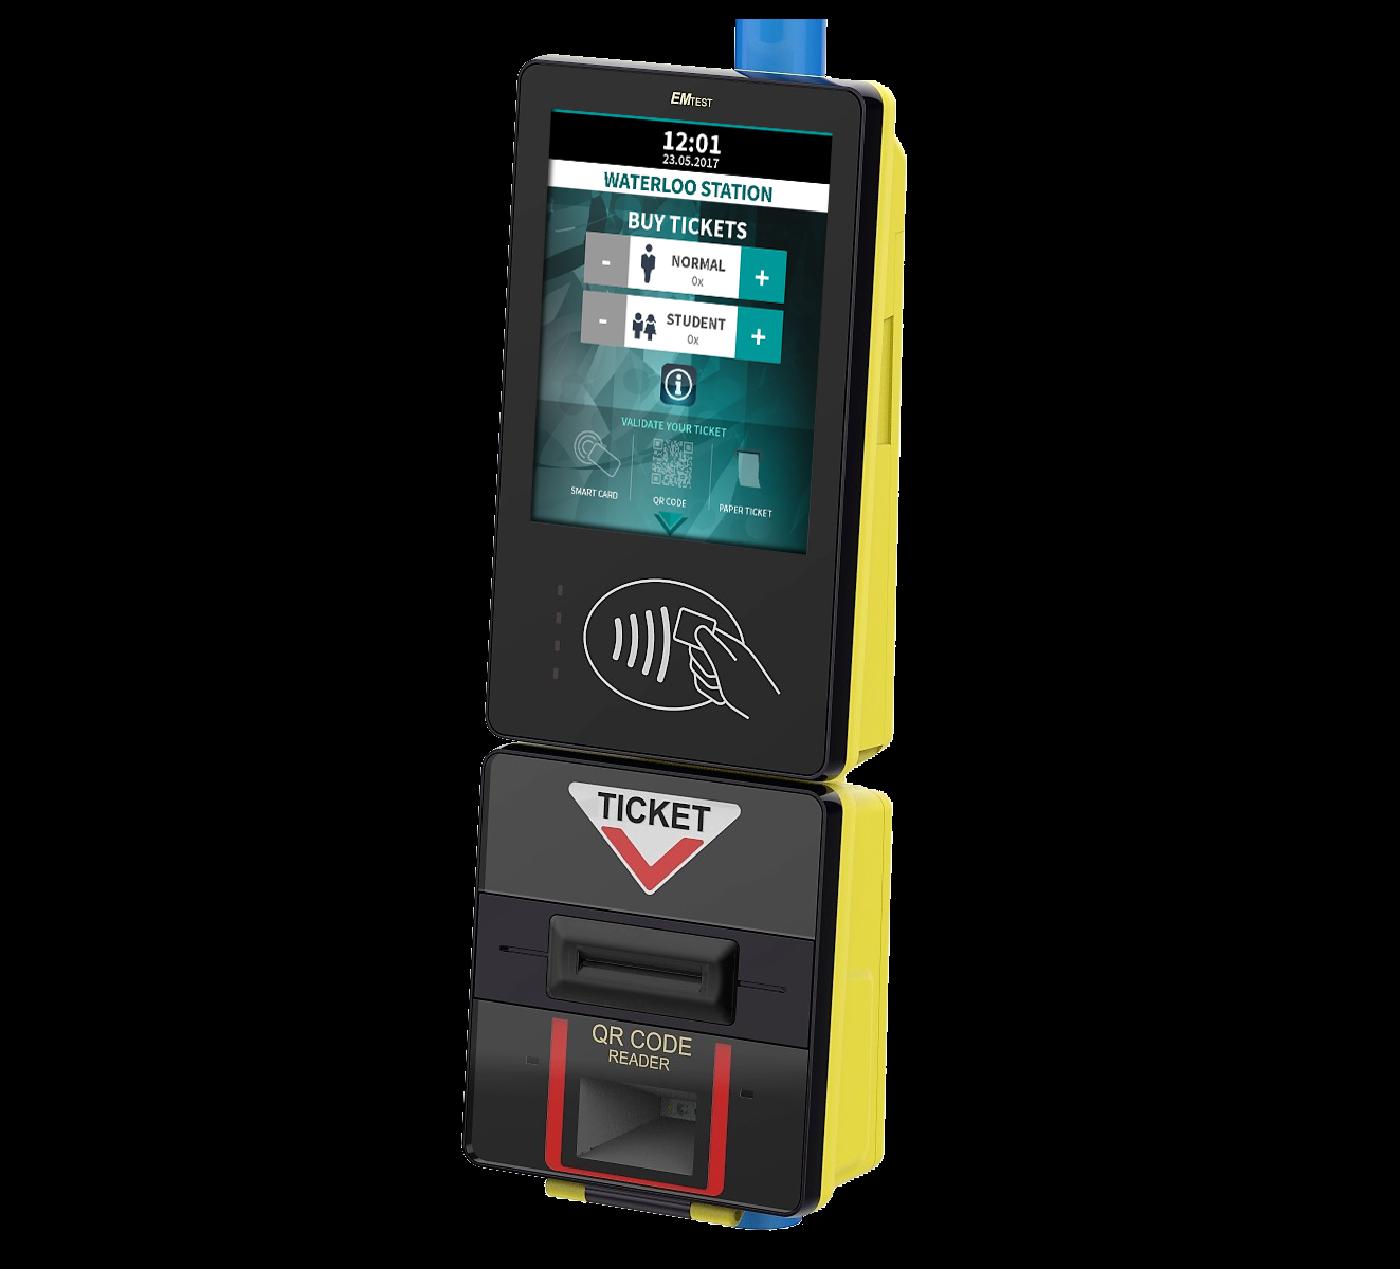 EMware - Smart card readers